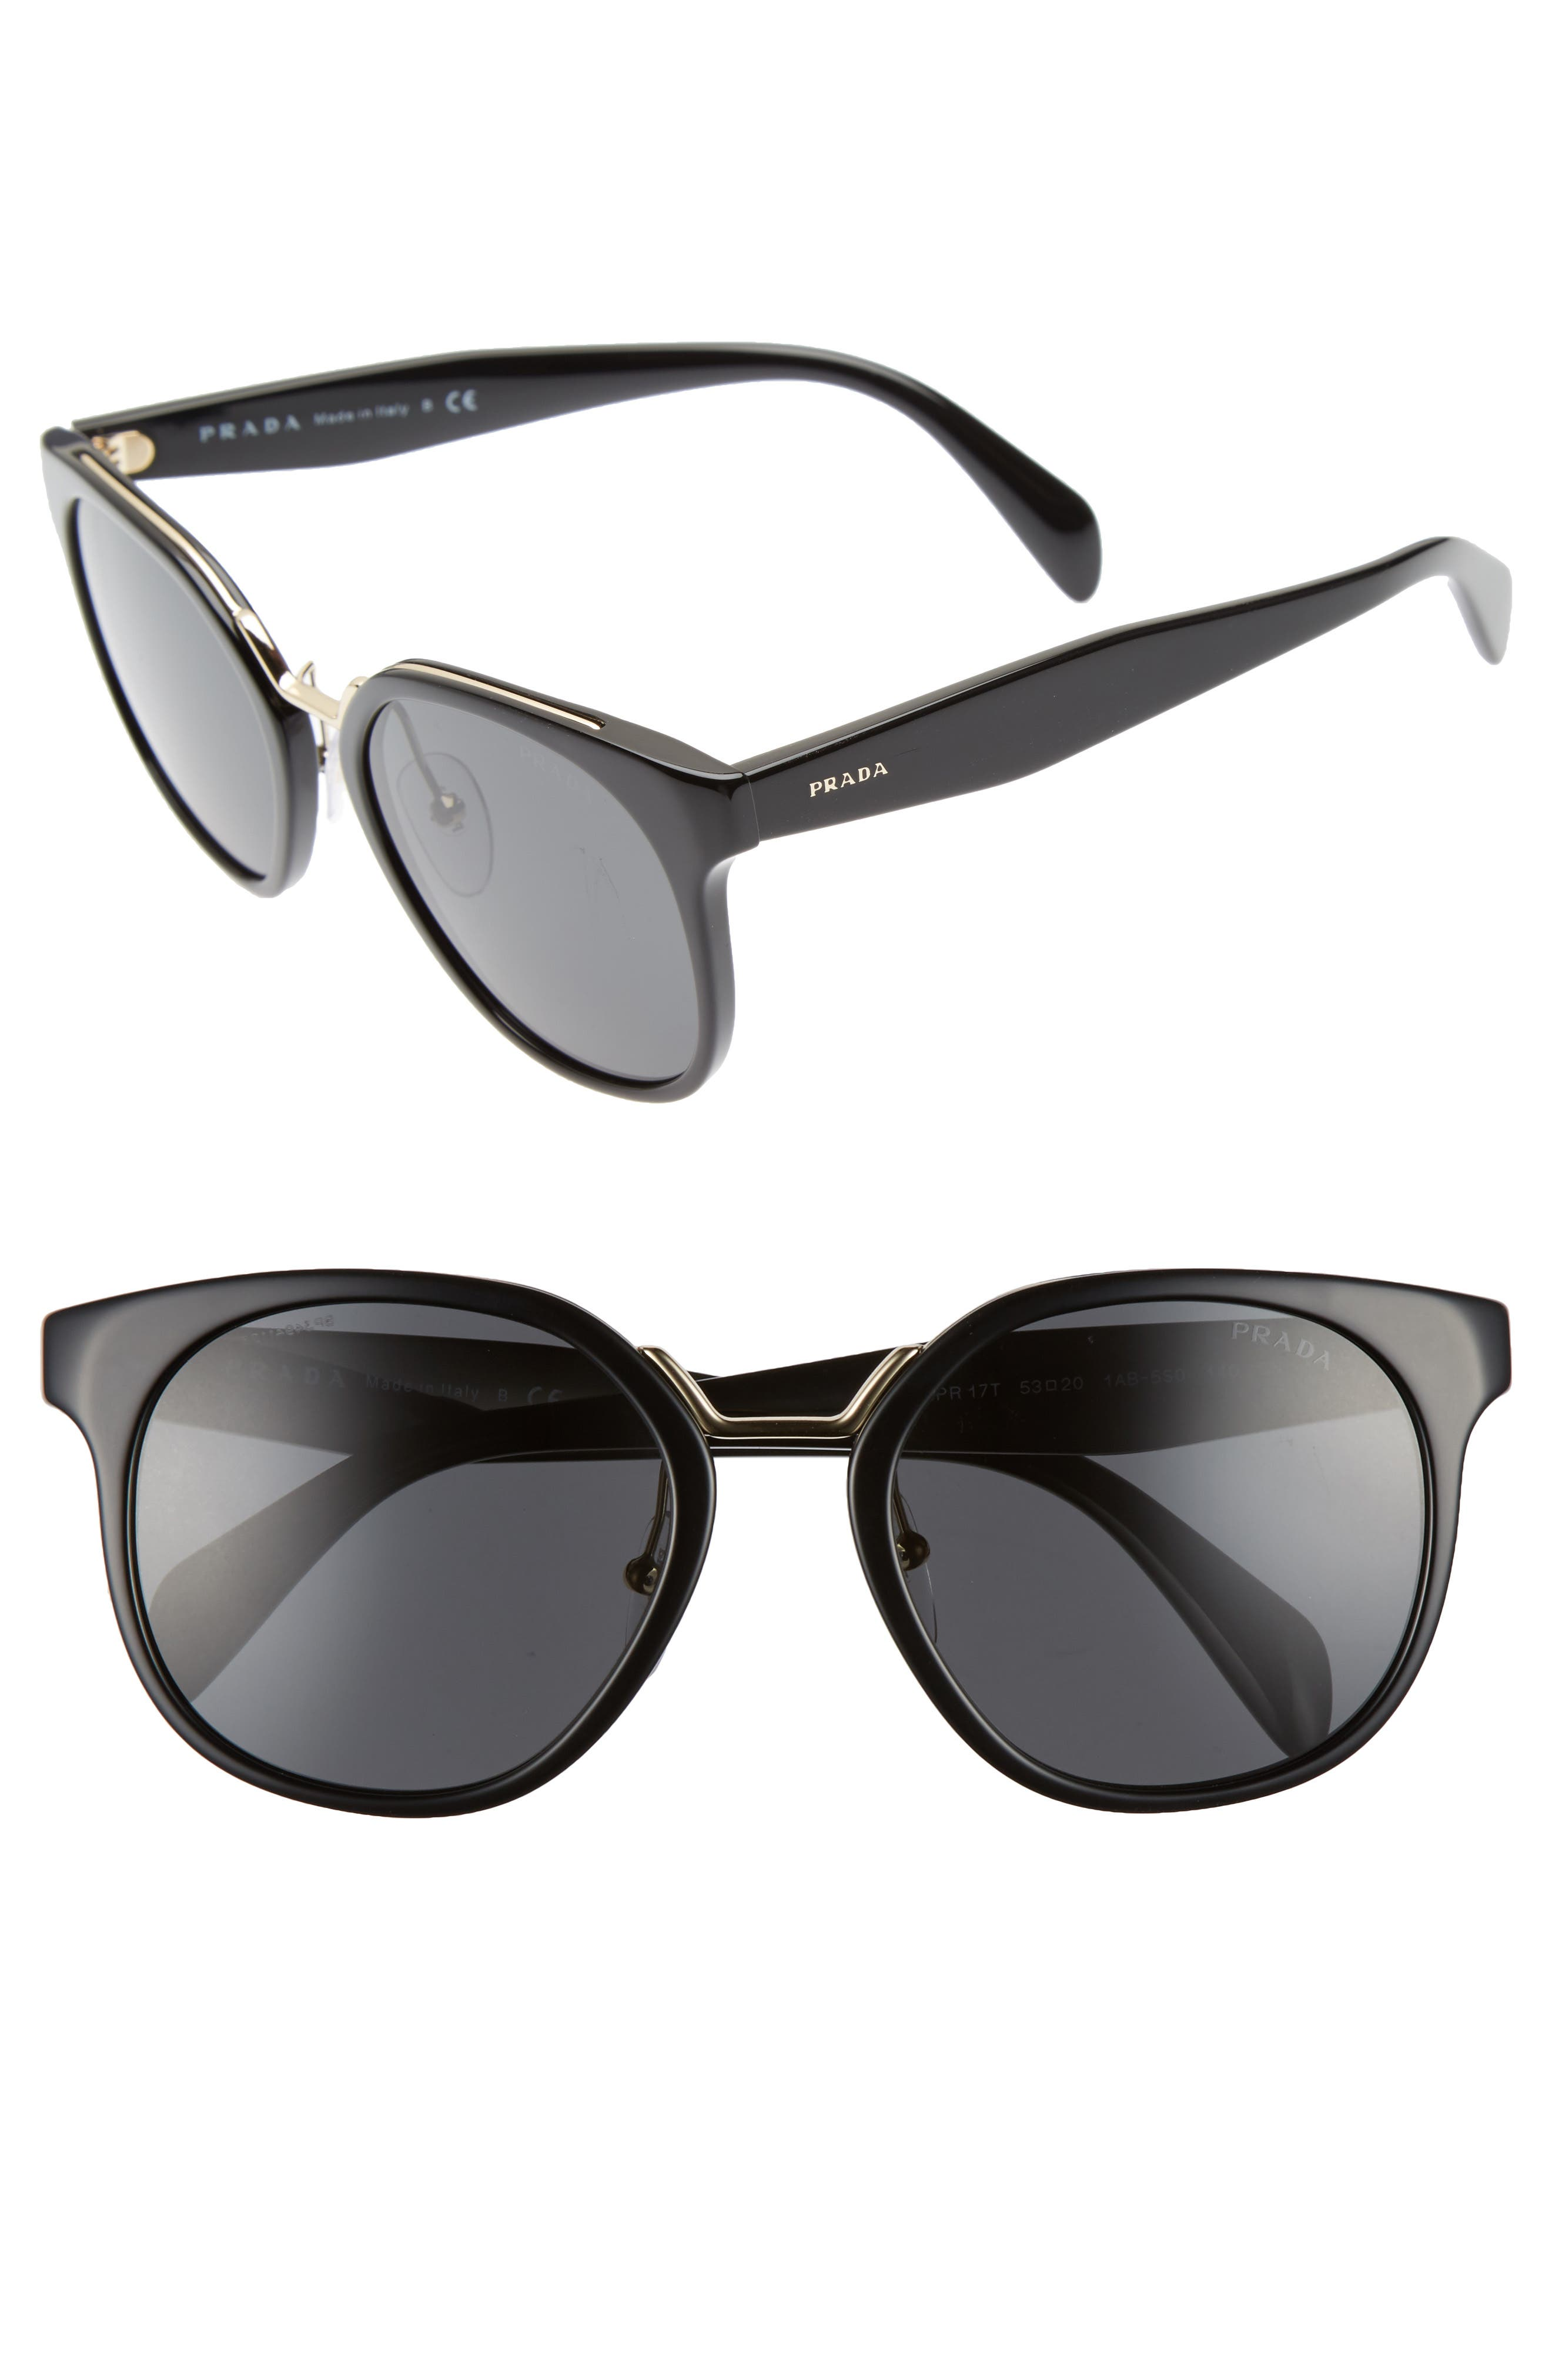 53mm Horn-Rimmed Sunglasses,                         Main,                         color, 020